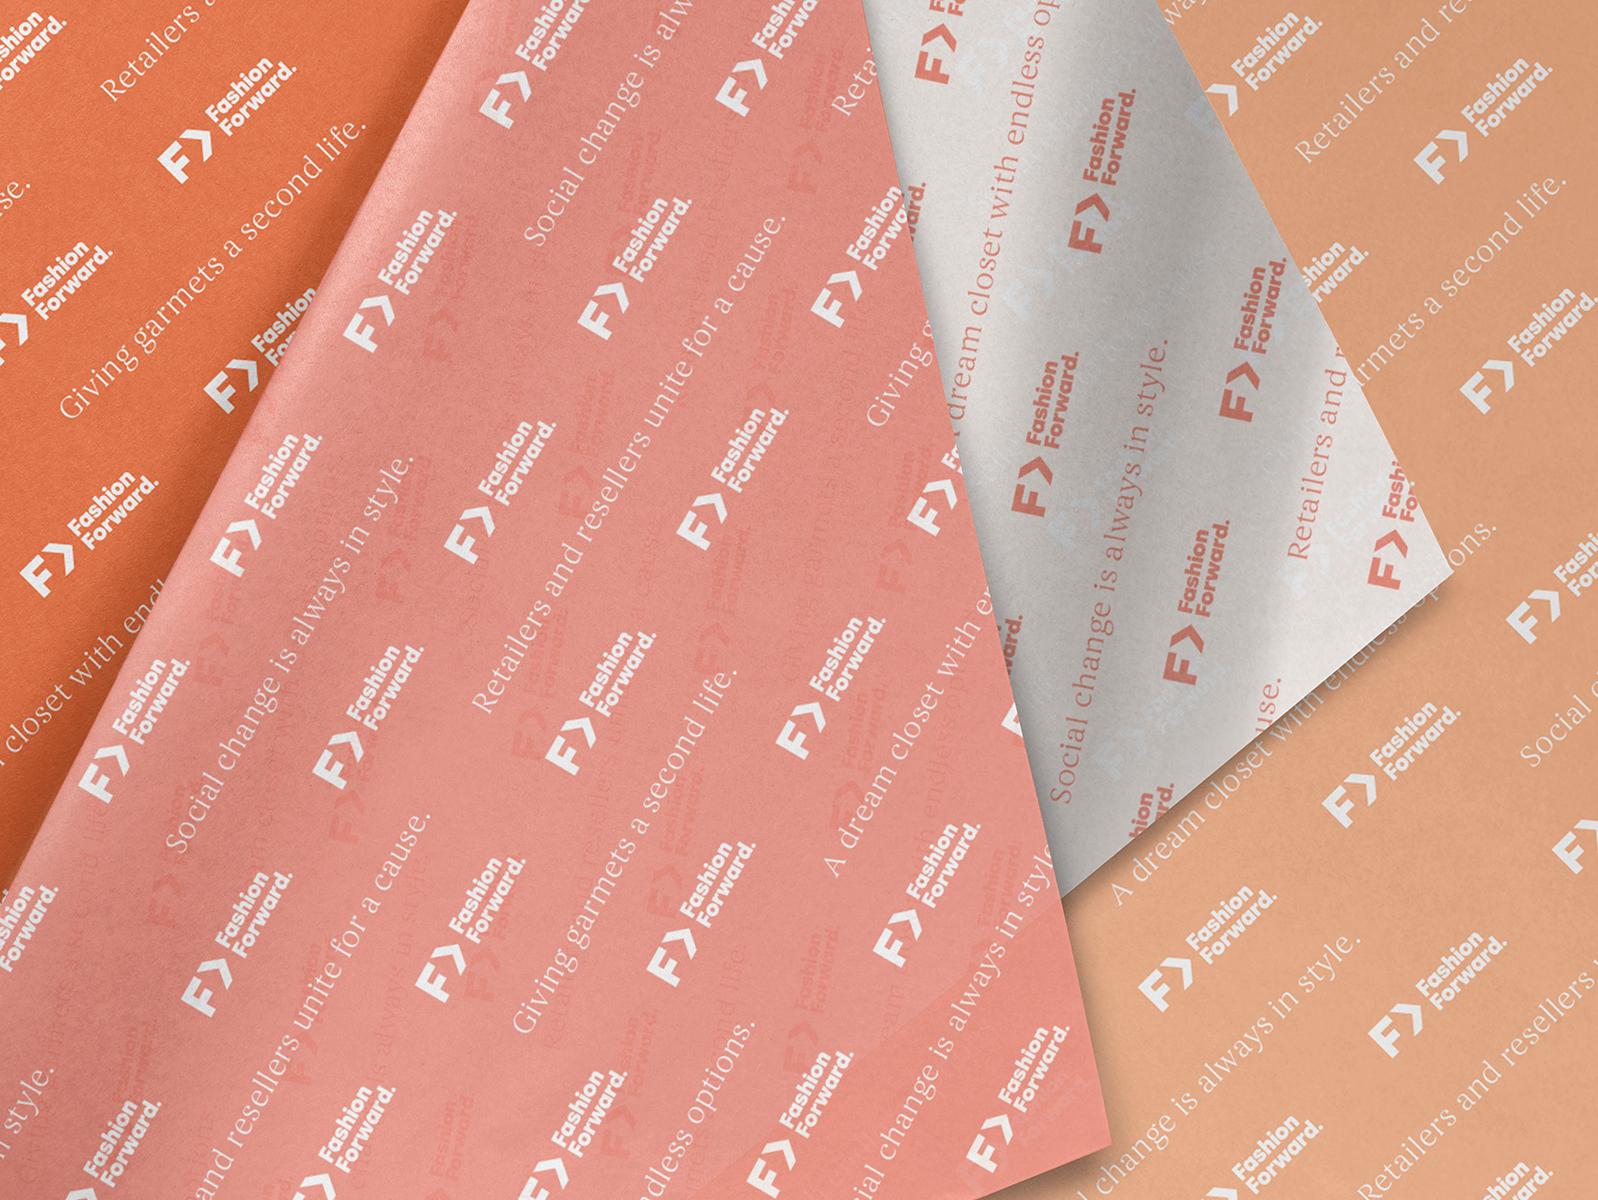 Fashion Forward / Tissue tissue paper orange peach pink femme color palette paper forward fashion identity logo